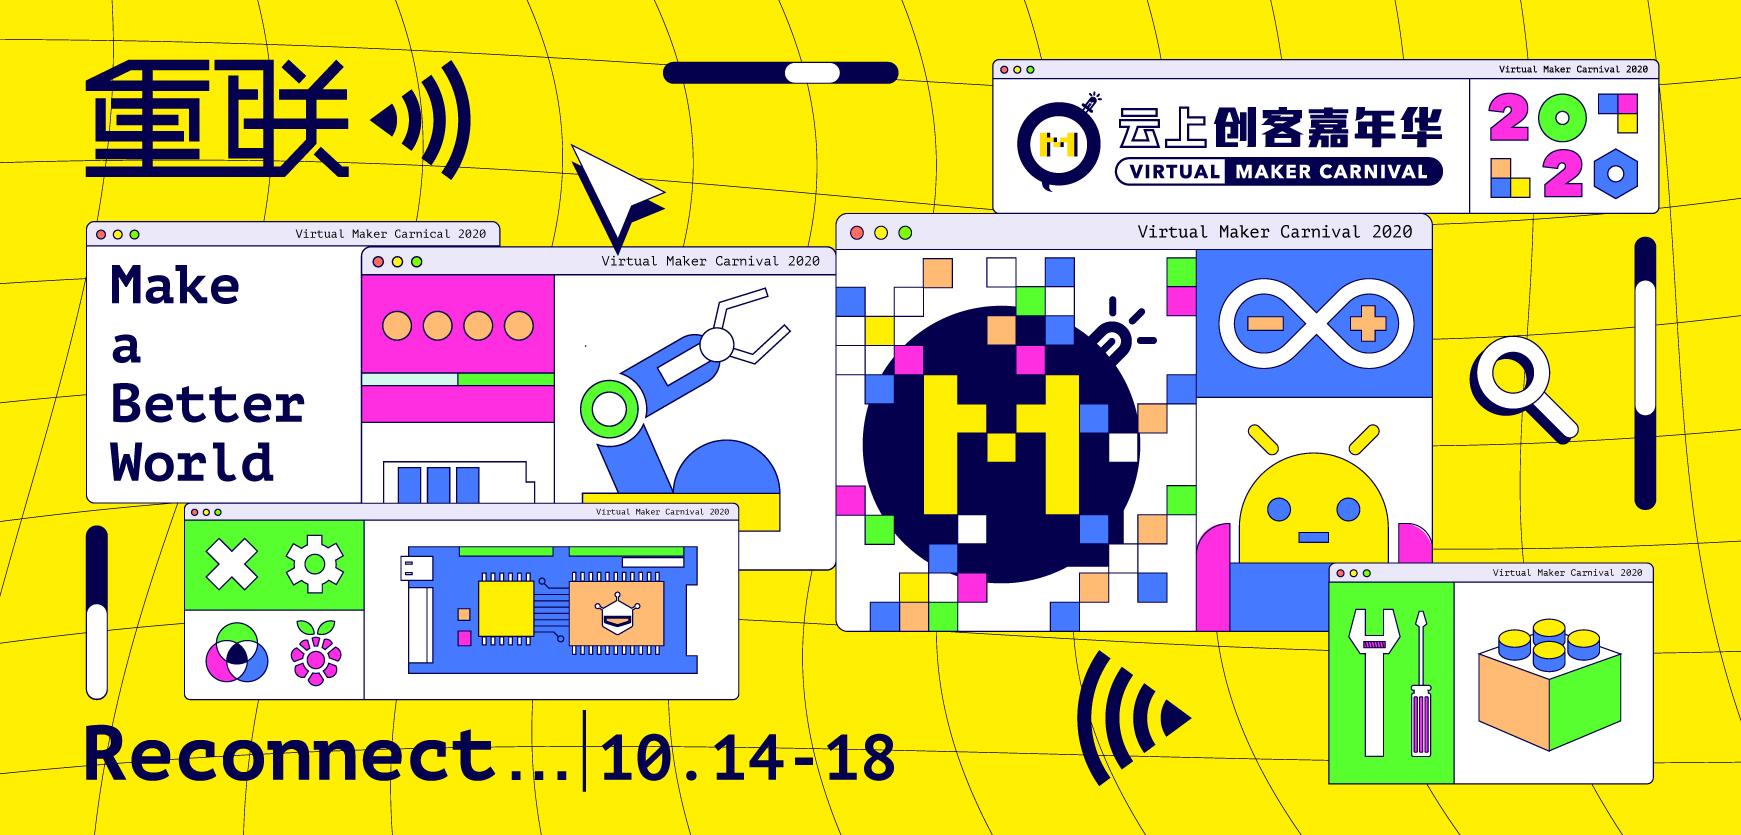 DFRobot最新创客活动-云上创客嘉年华